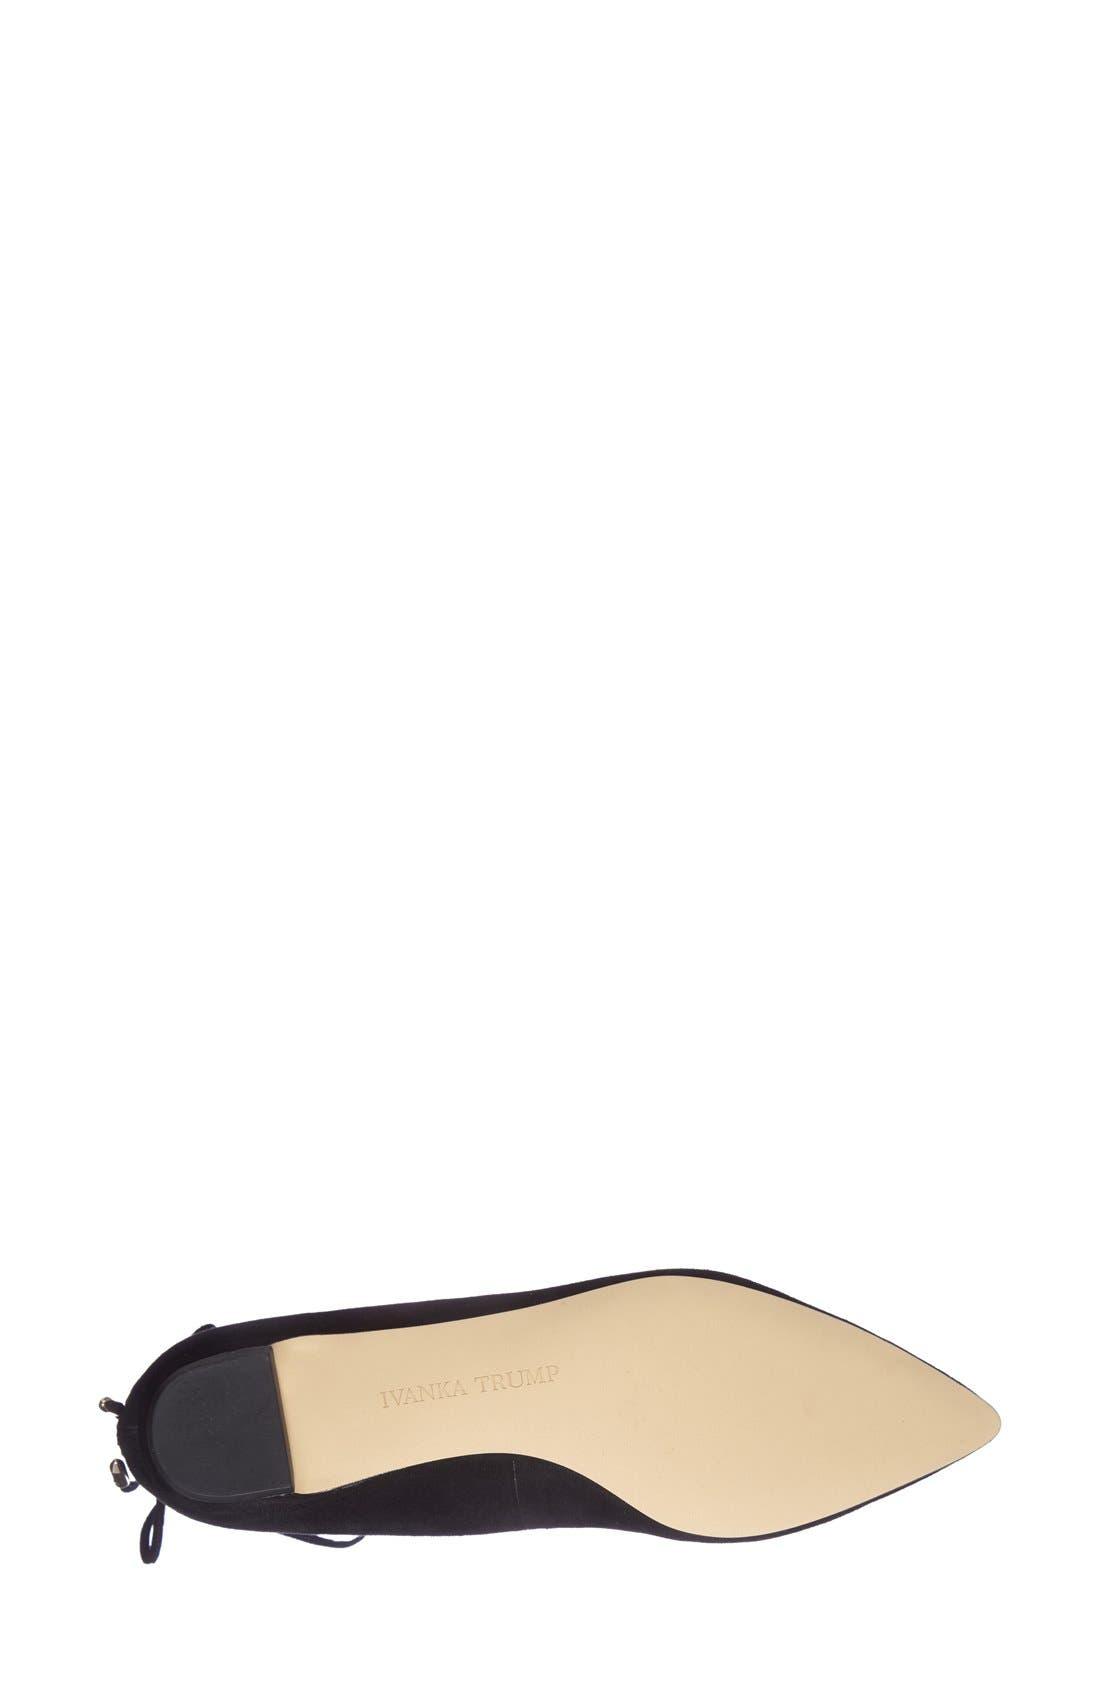 Alternate Image 4  - Ivanka Trump 'Tropica' Pointy Toe Ghillie Flat (Women)